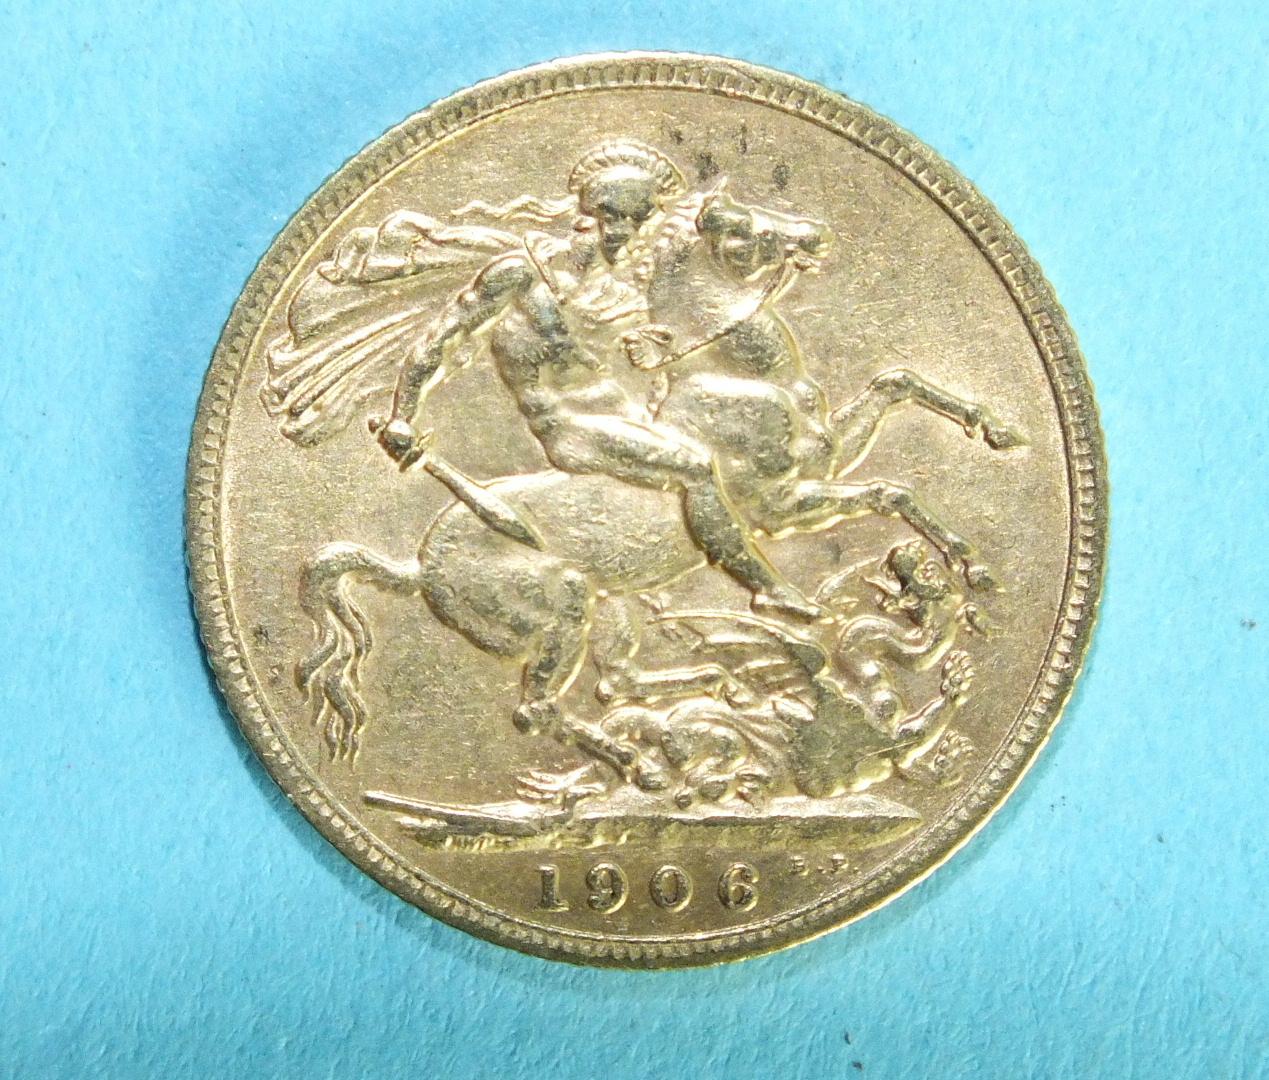 Lot 370 - An Edward VII 1906 sovereign.